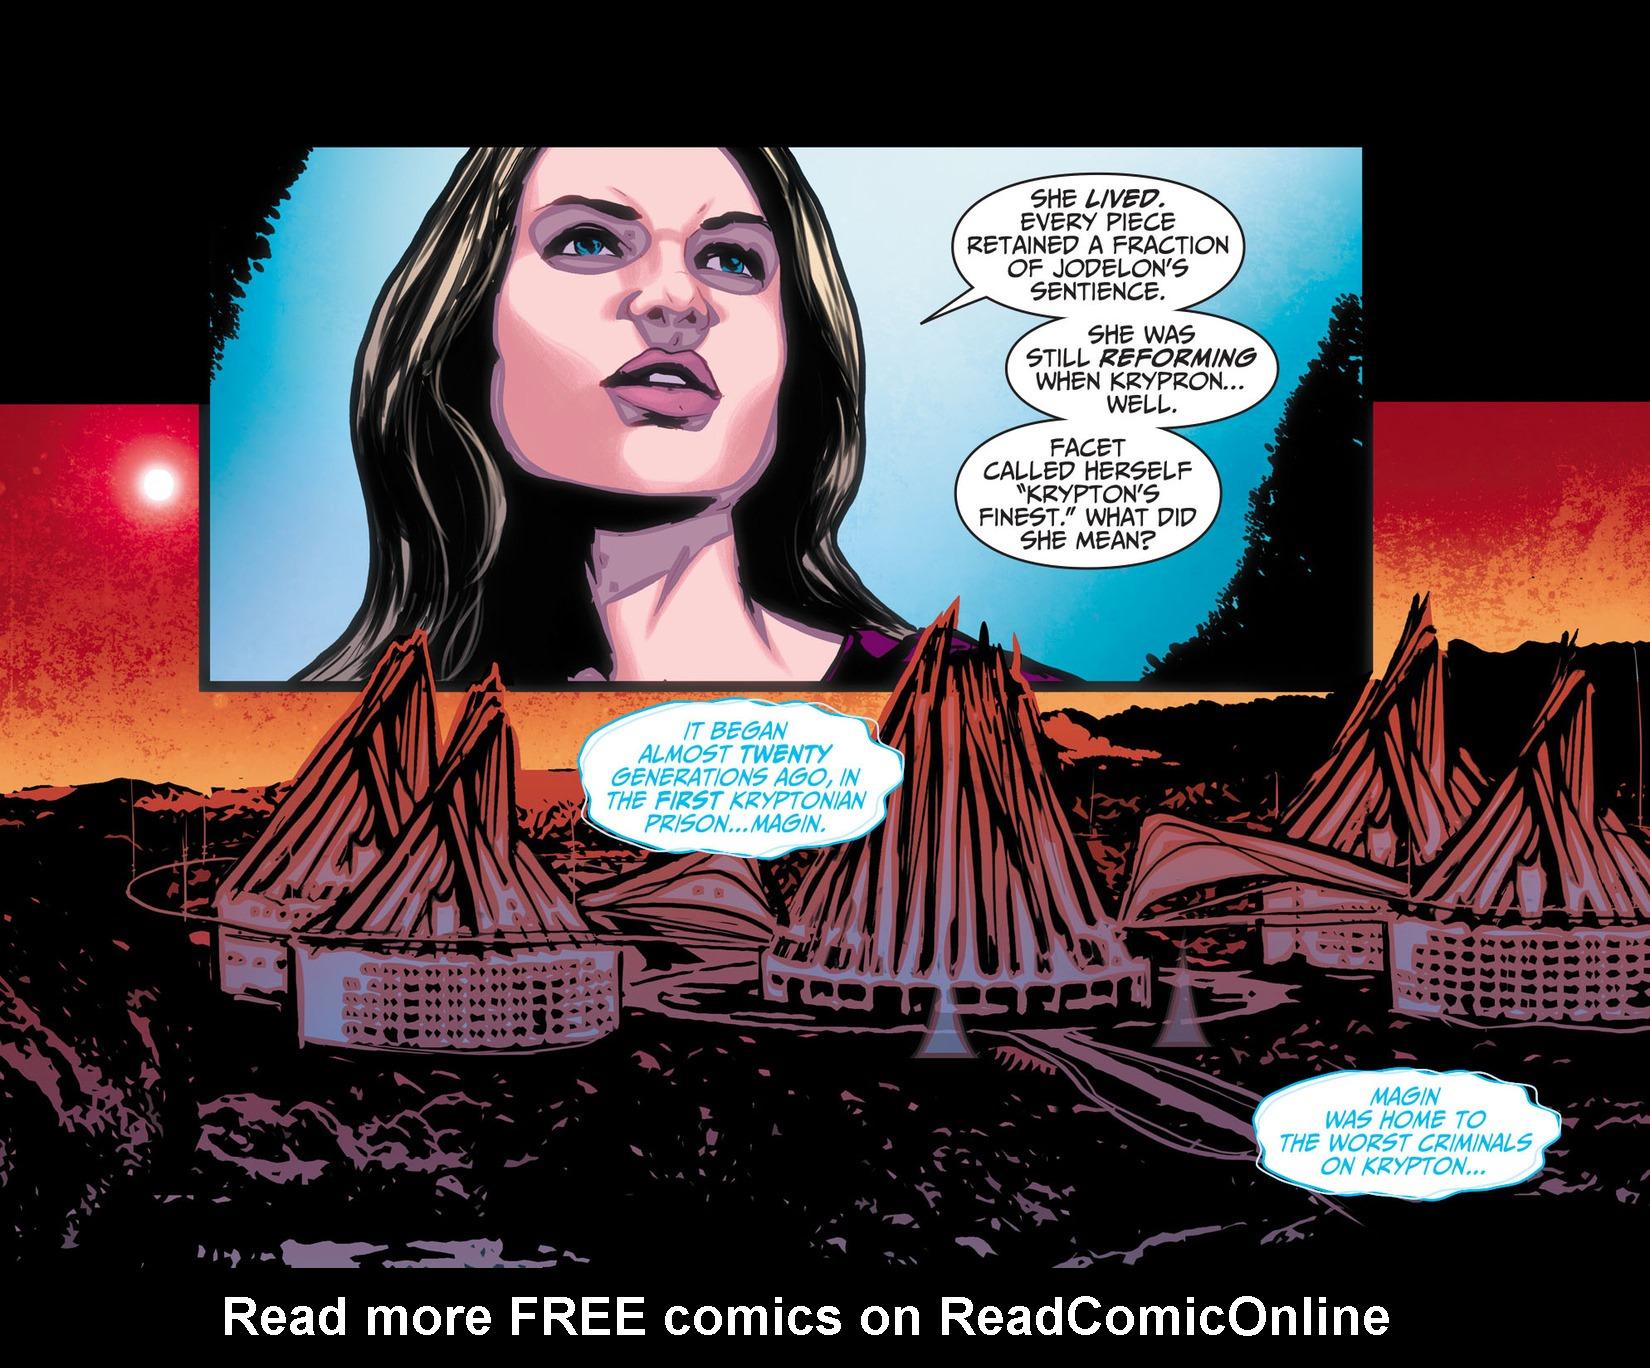 Read online Adventures of Supergirl comic -  Issue #10 - 10